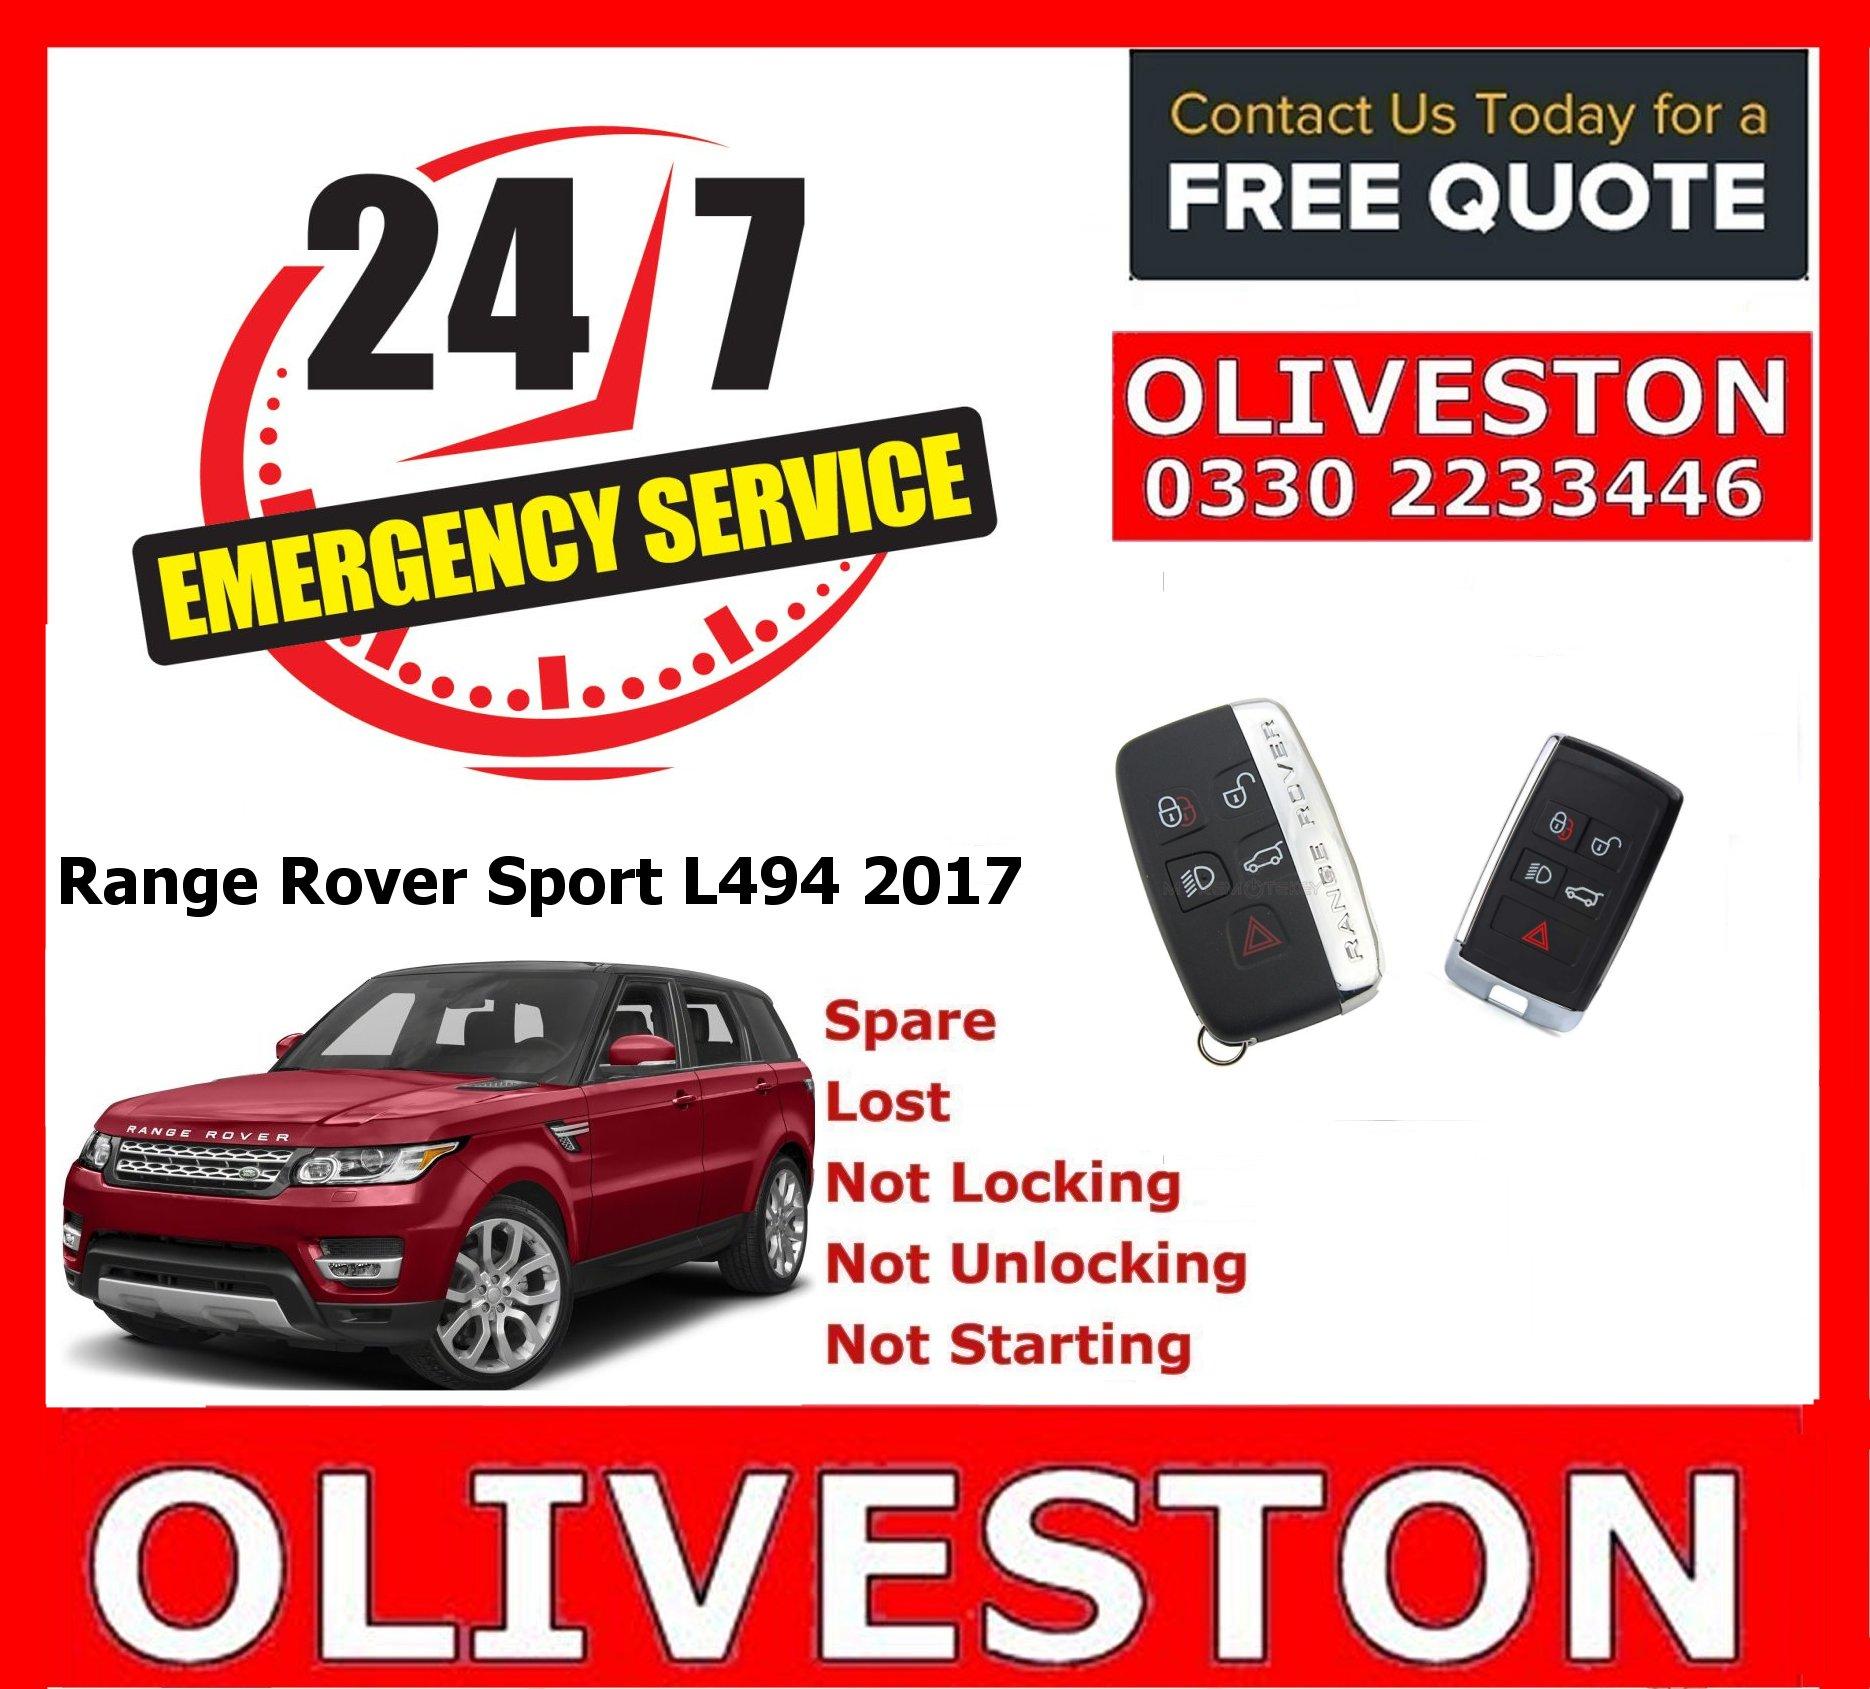 Range Rover Land Rover Jaguar Spare lost keys Warrington Chester Crewe Runcorn Ellesmere_Port Macclesfield Northwich Cheshire North West